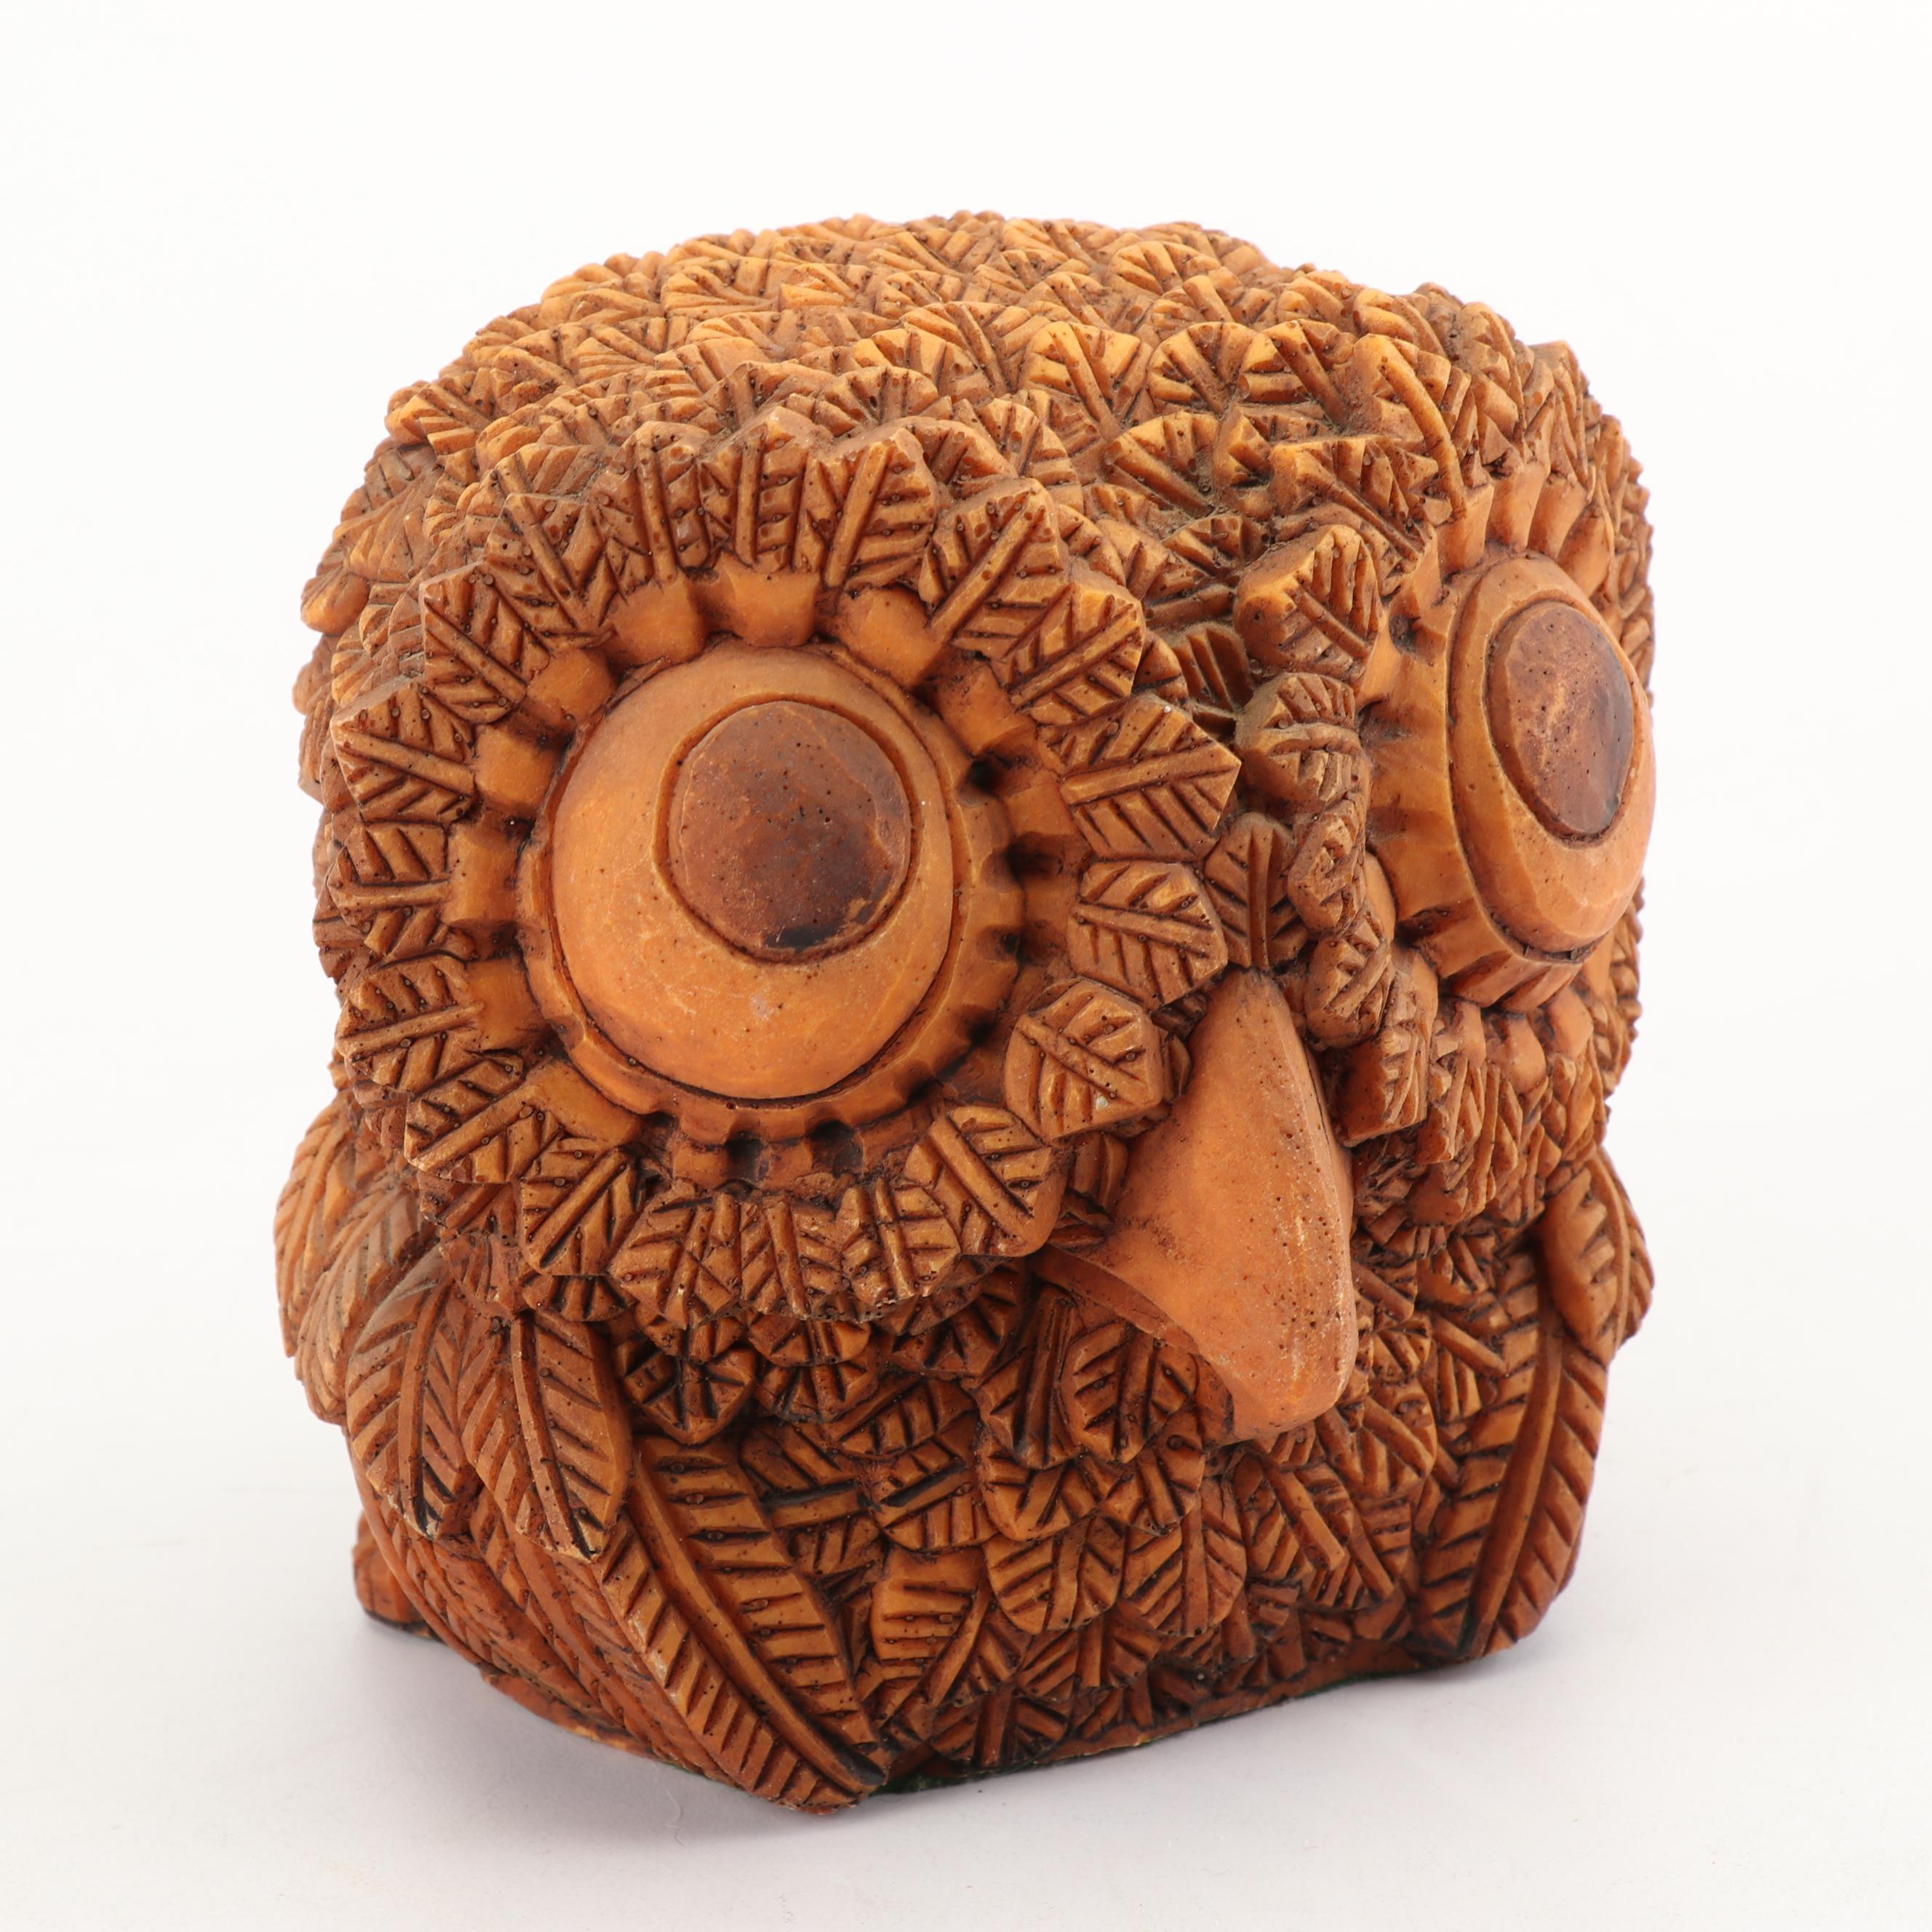 Cast Resin Owl Figurine, circa 1970